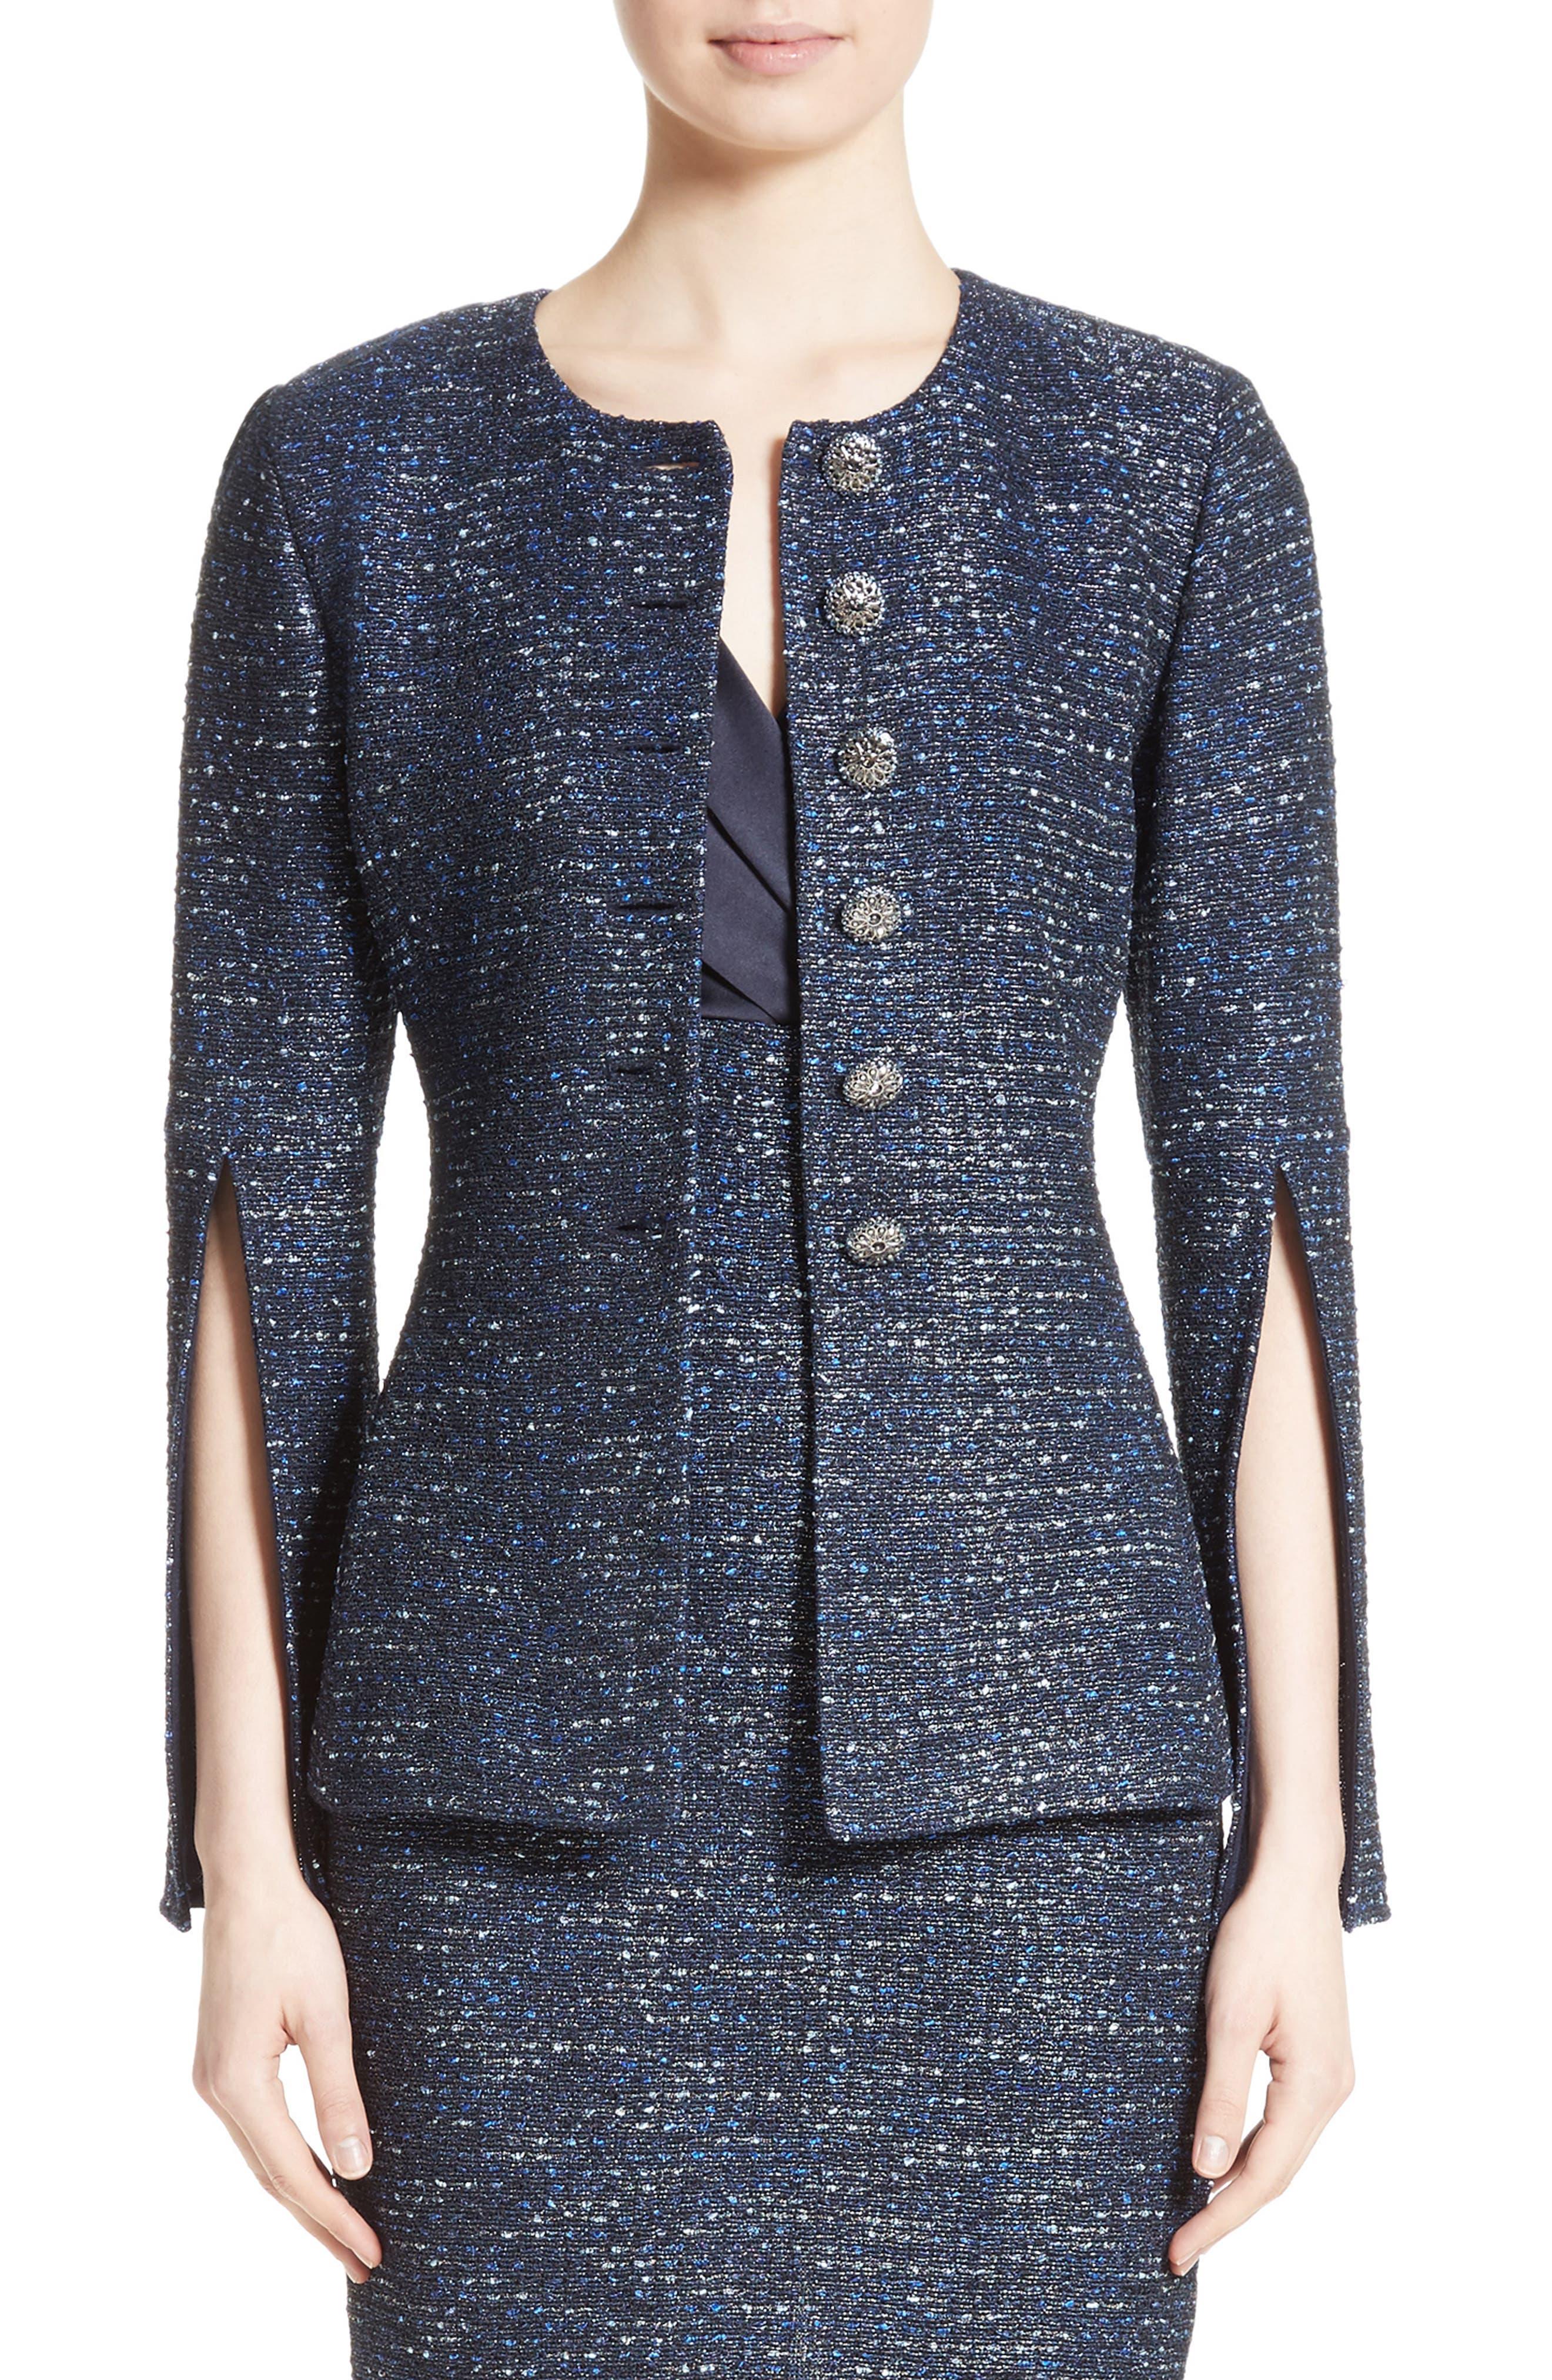 Main Image - St. John Collection Alisha Sparkle Tweed Jacket